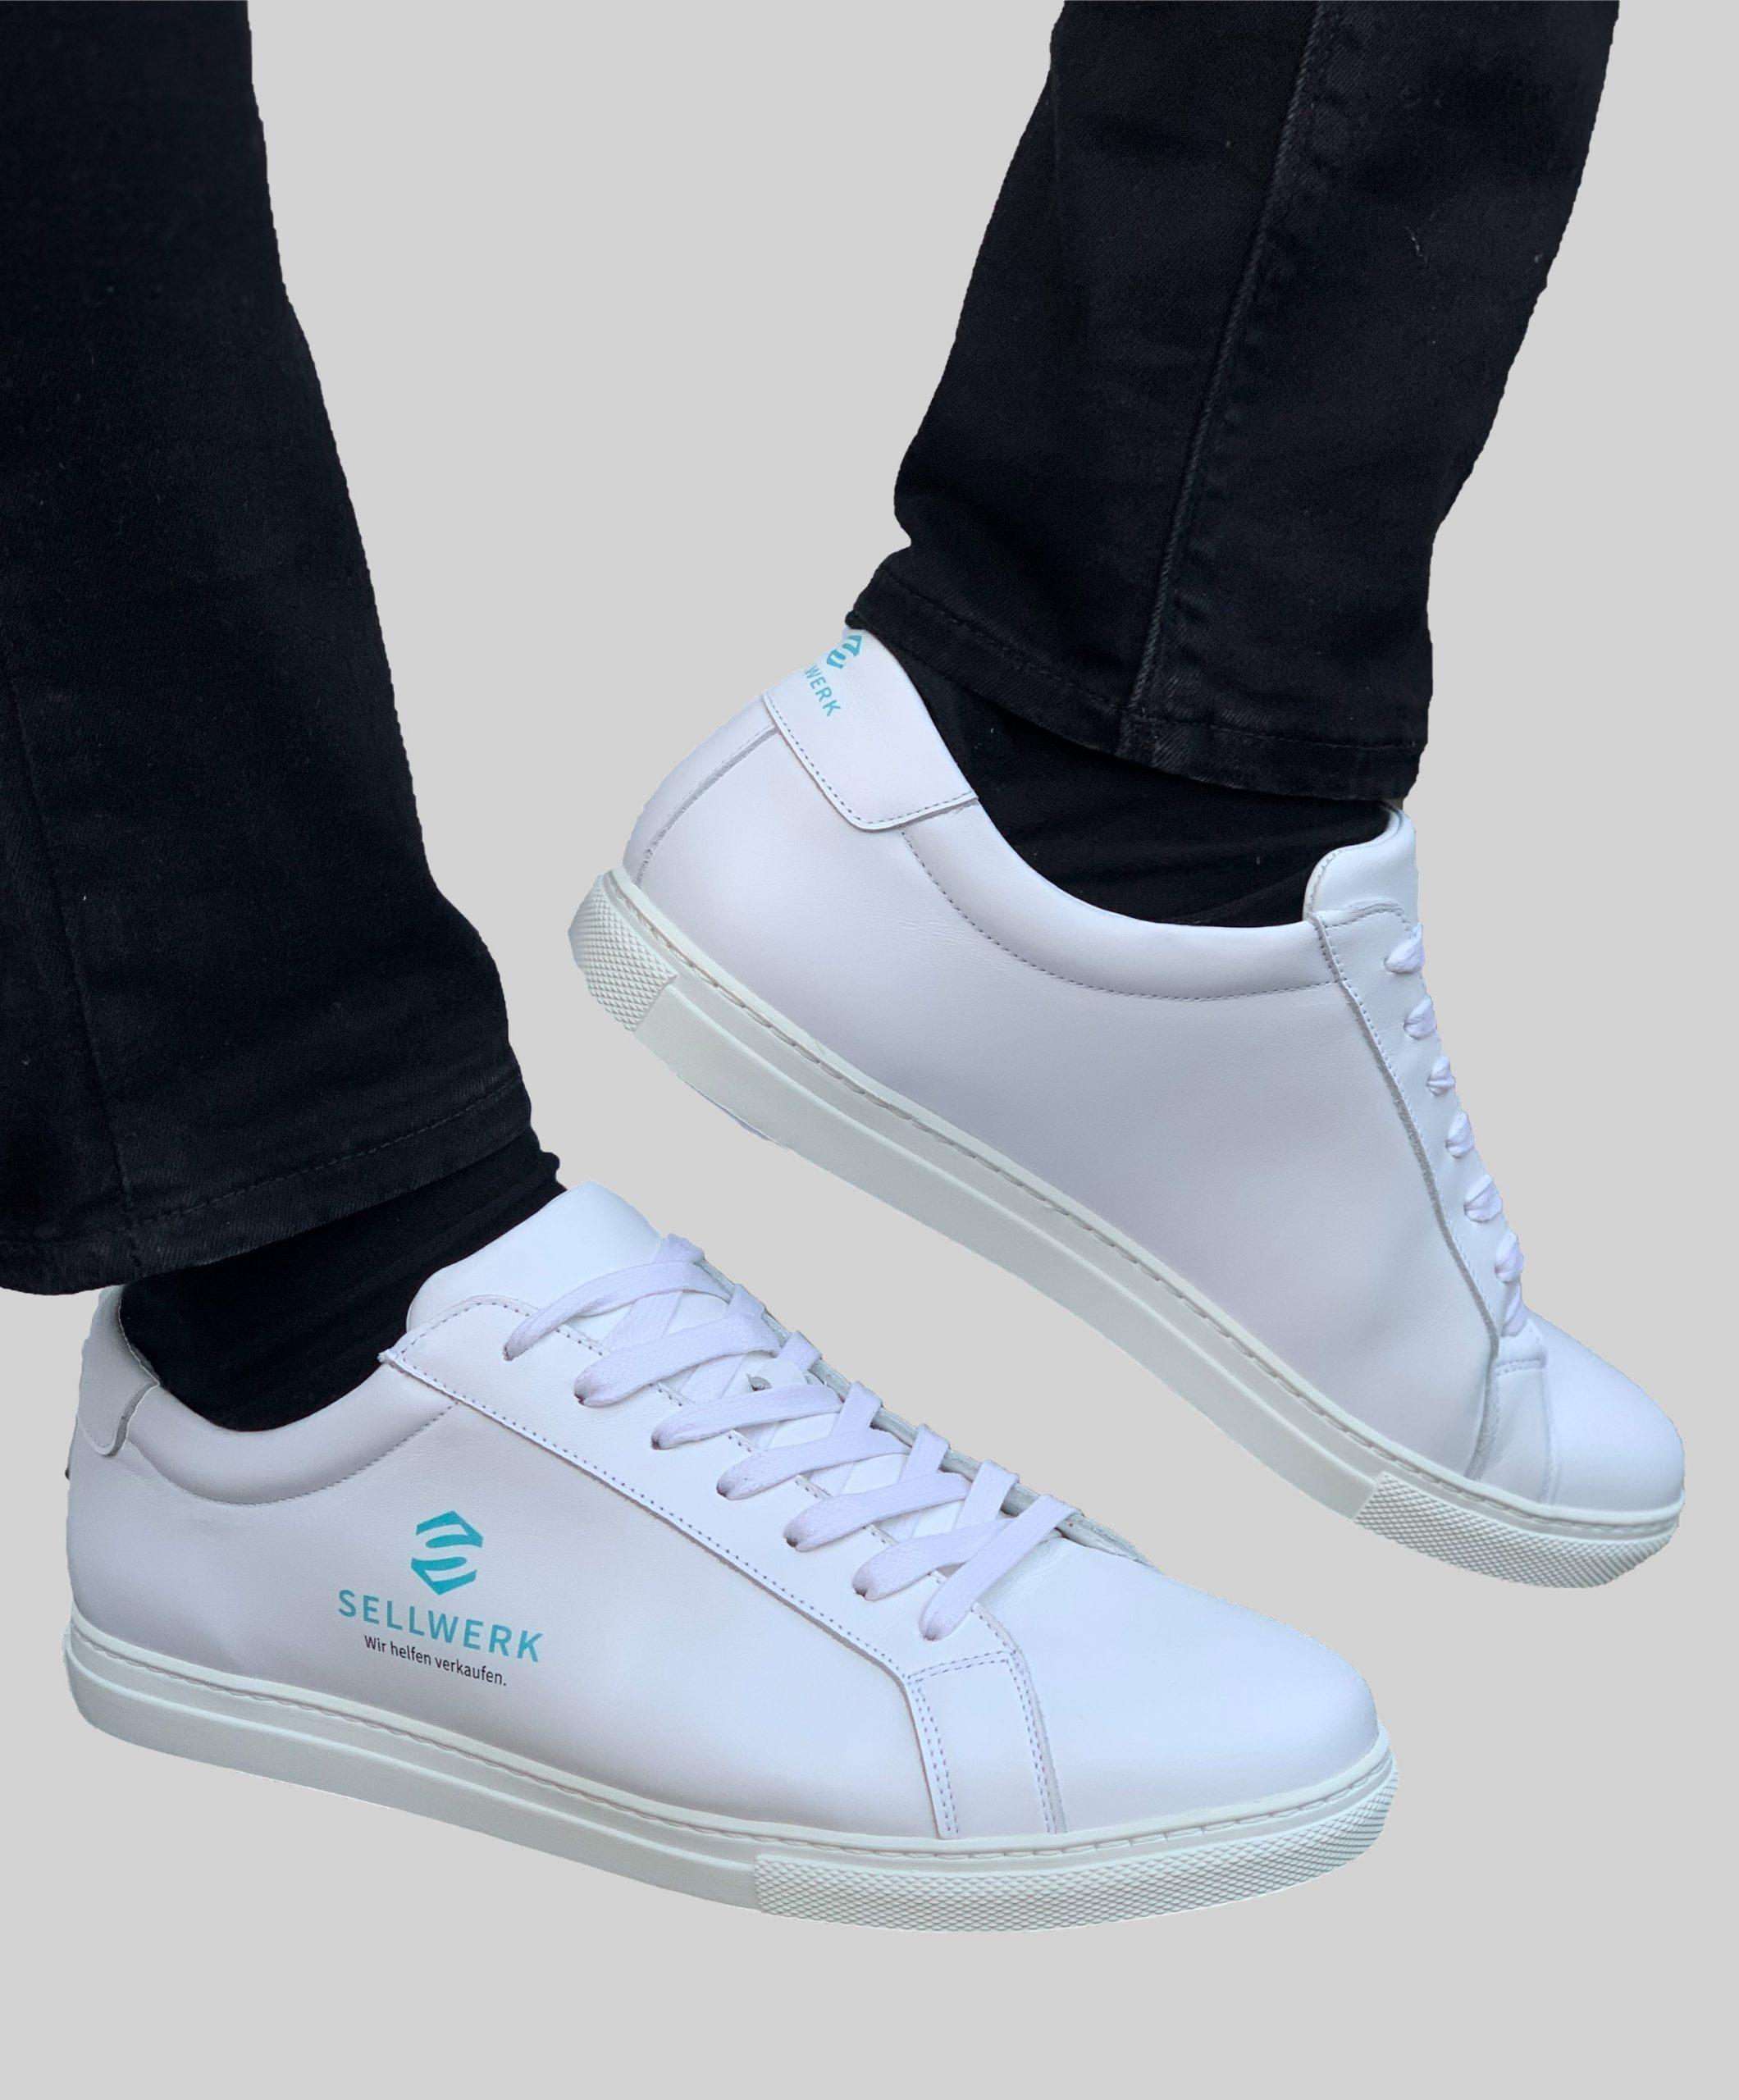 Sellwerksneaker